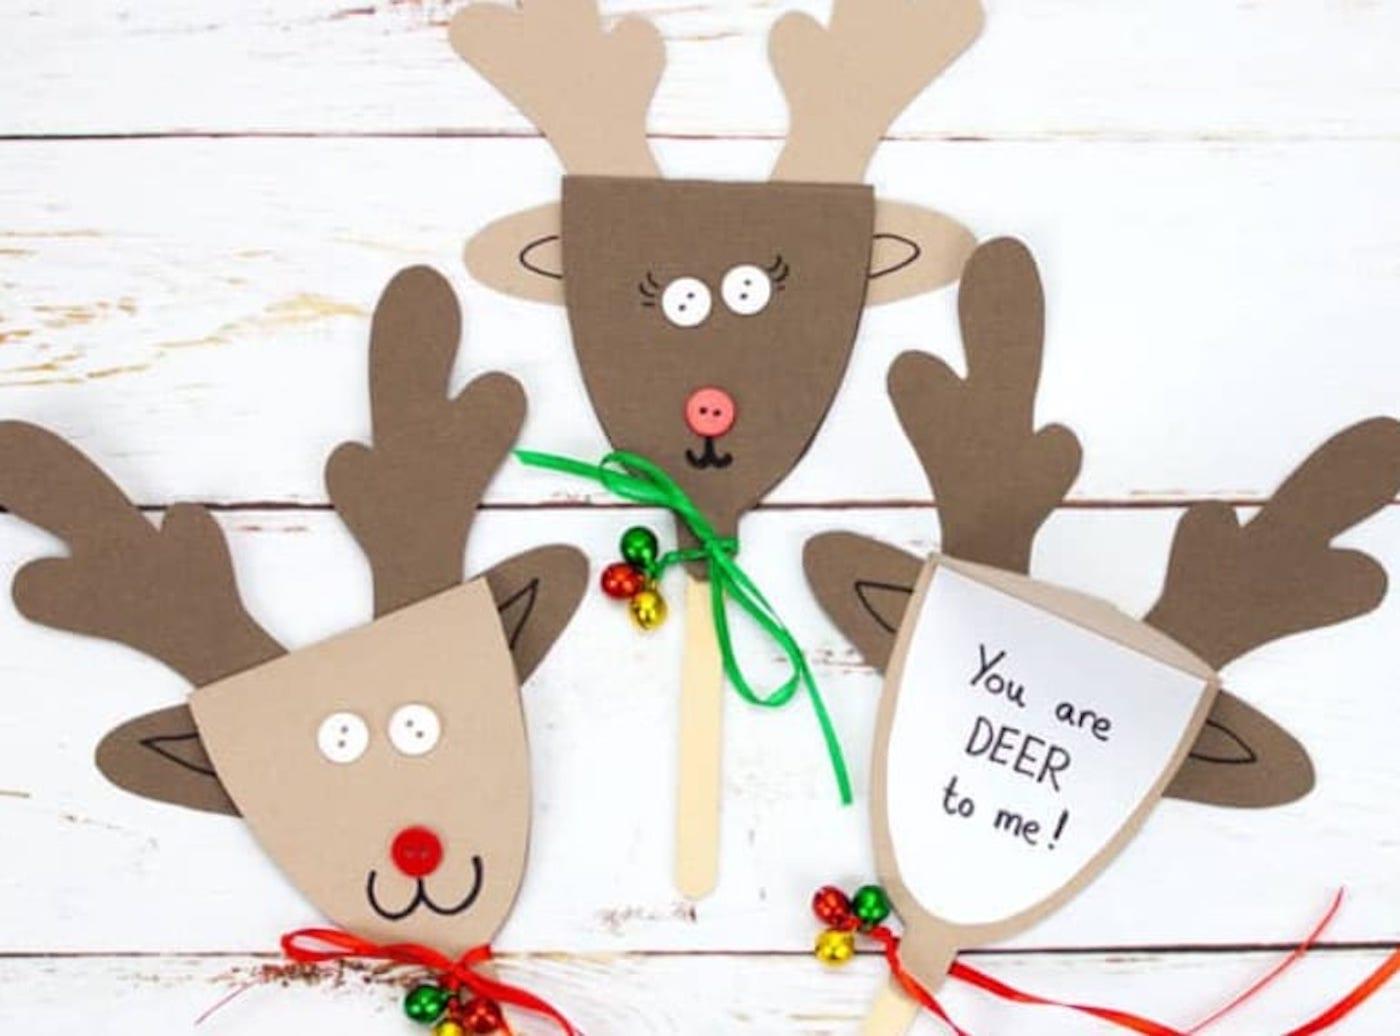 Make some cute DIY Christmas cards